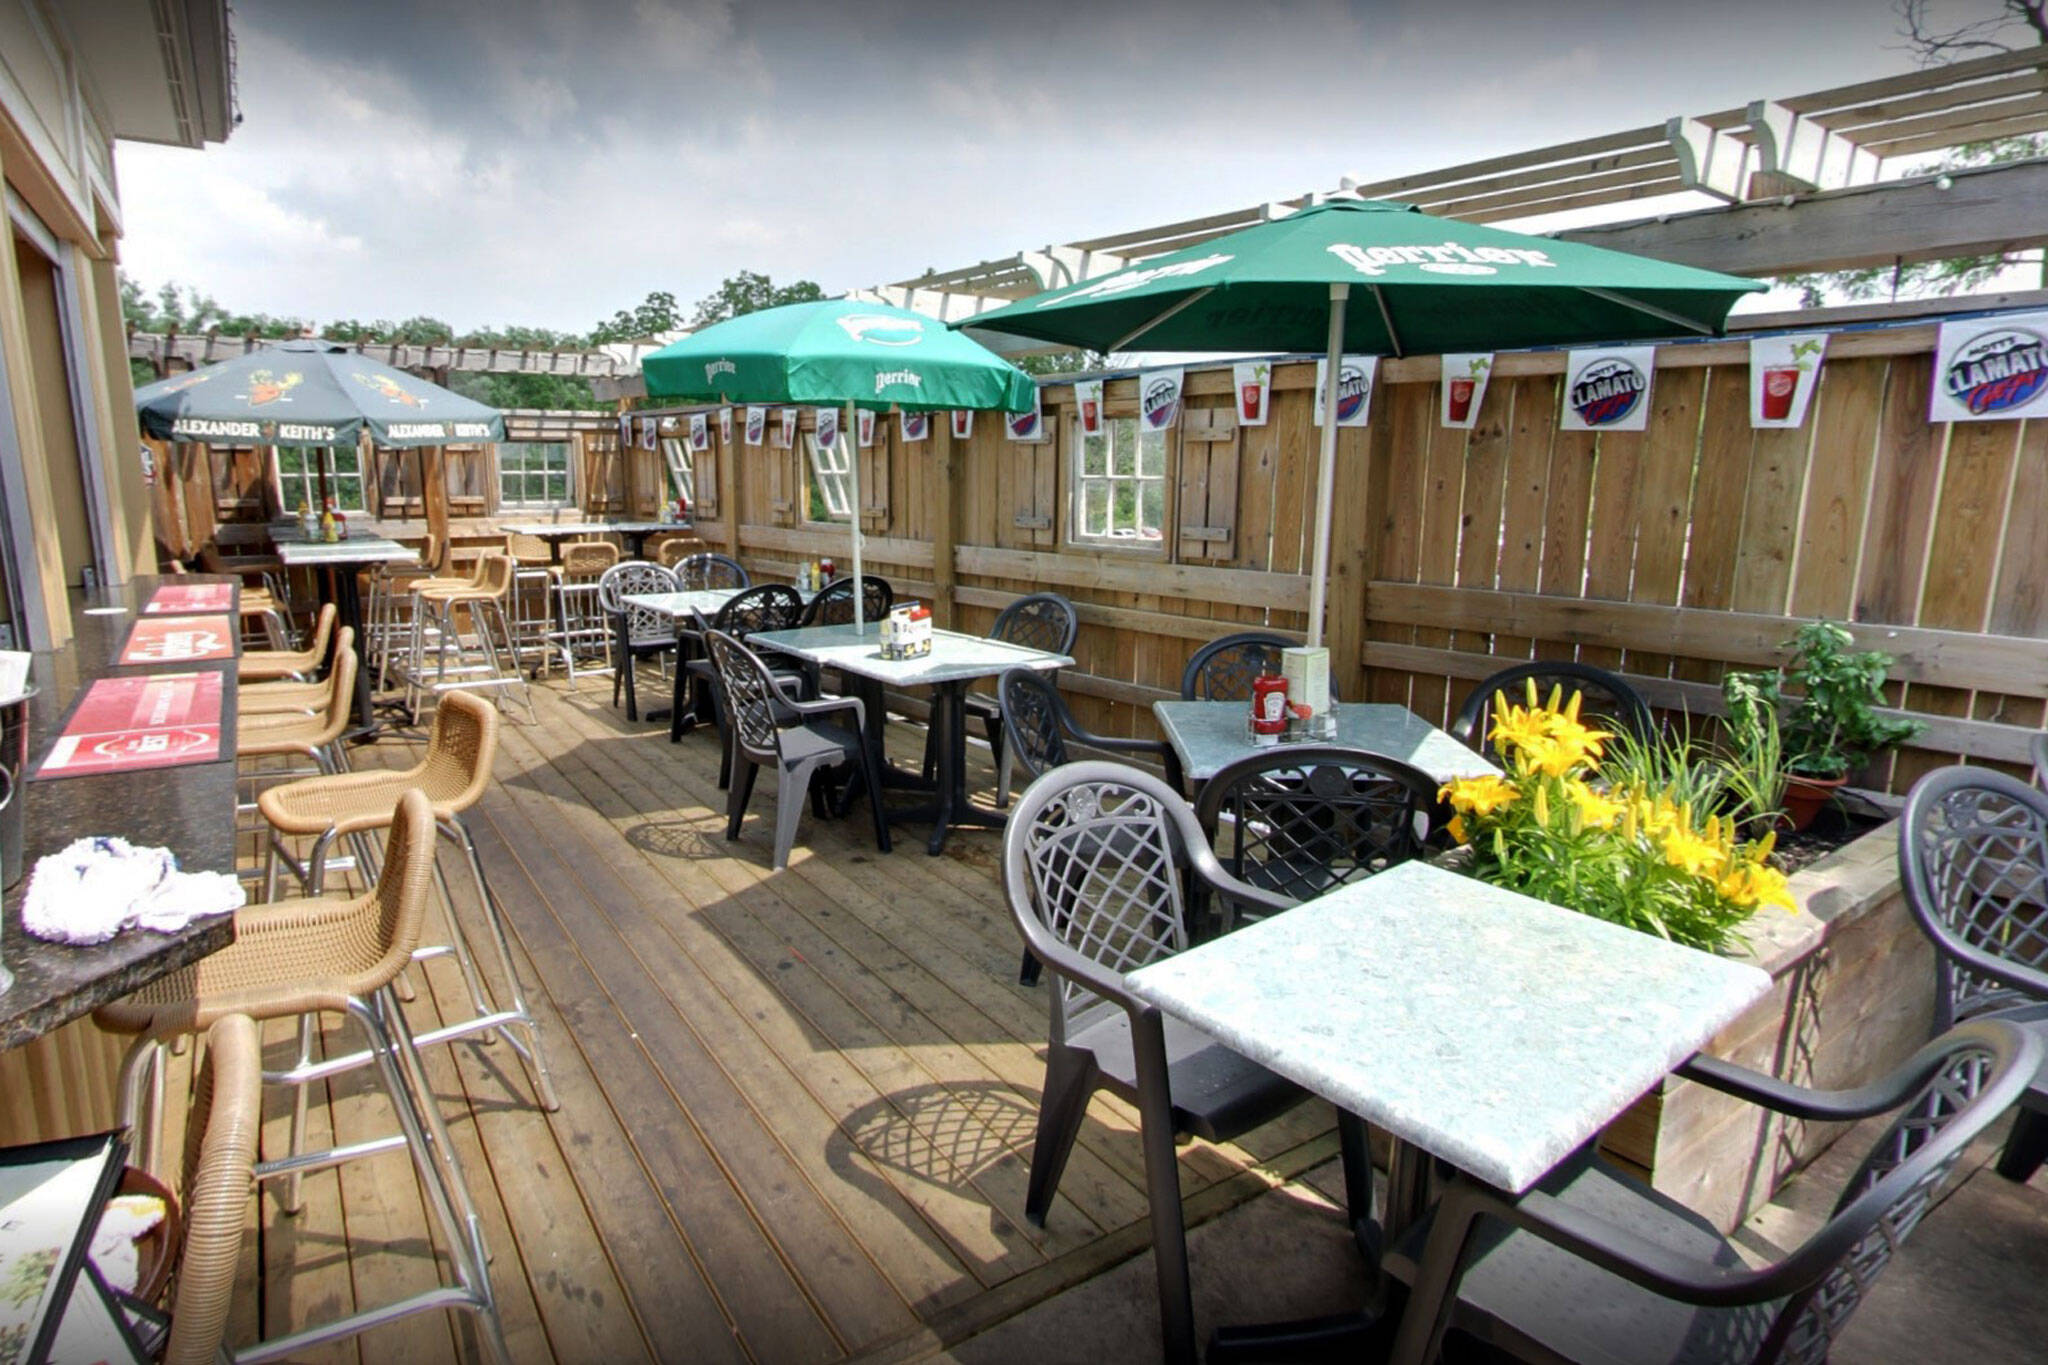 restaurant patios open